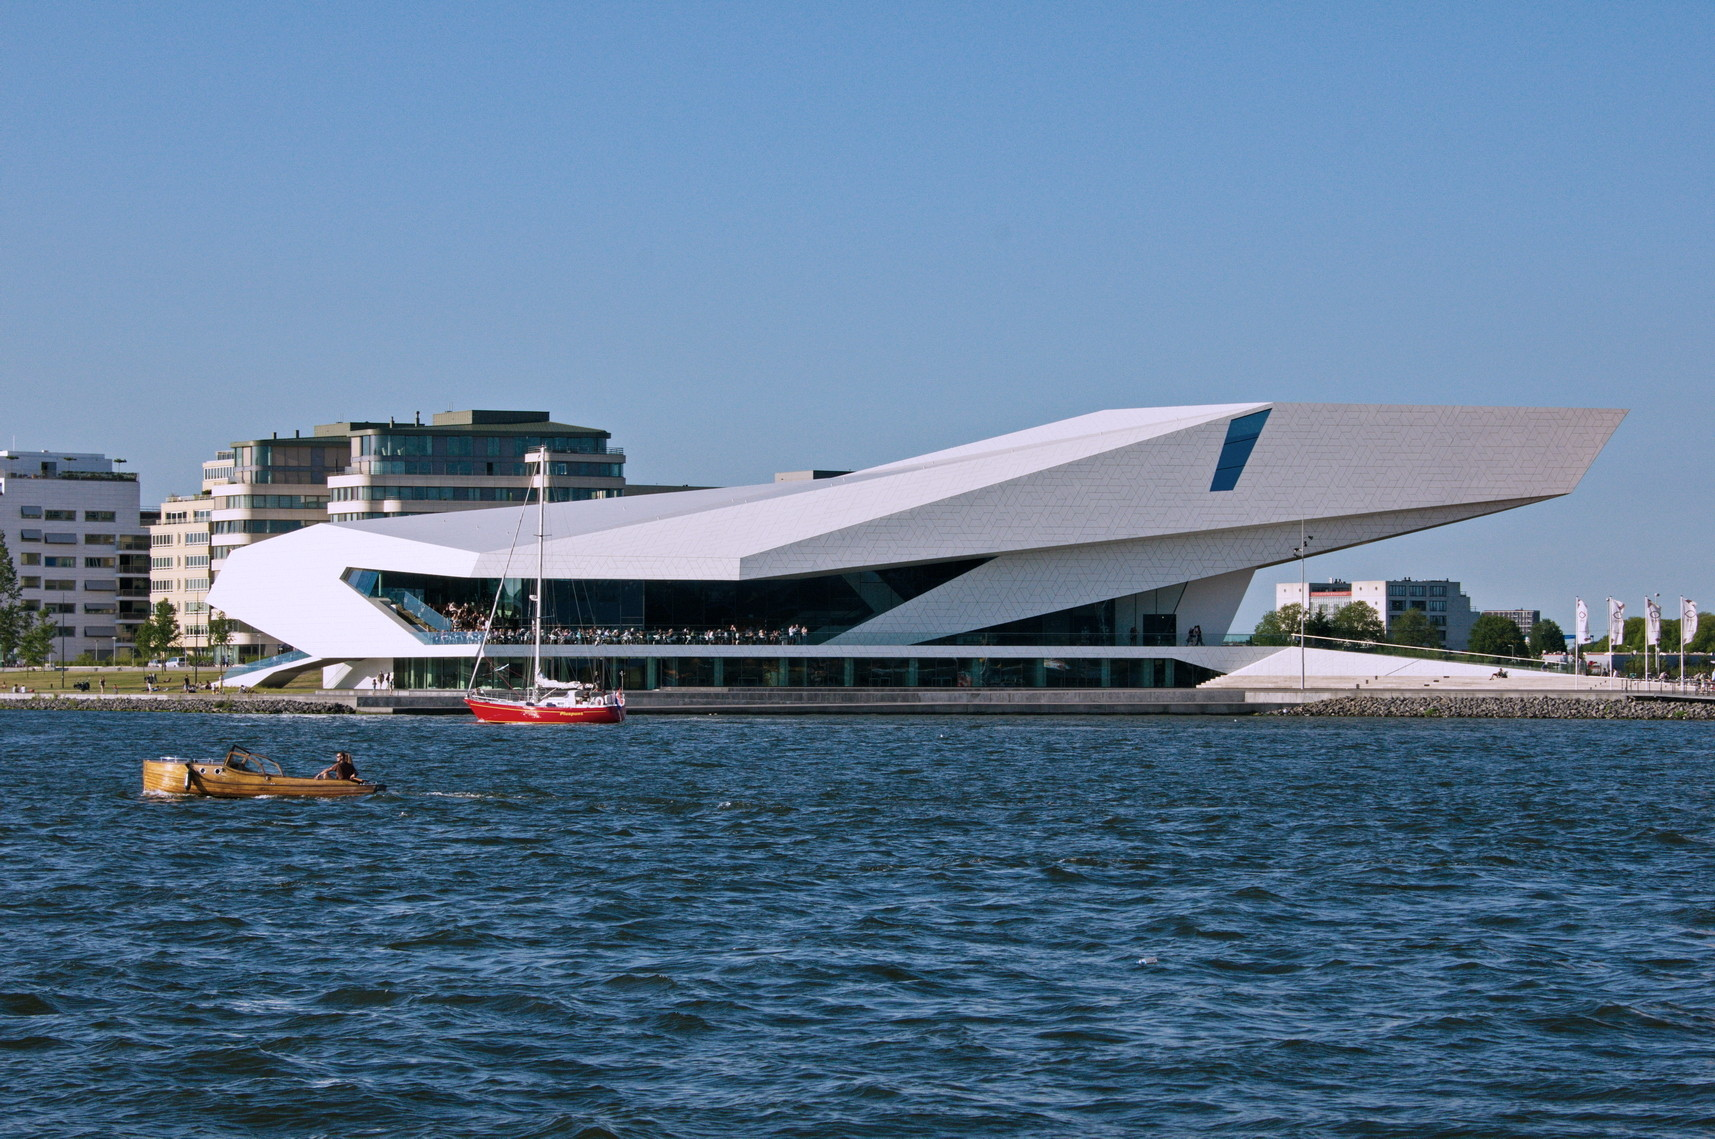 , Ijsselmeer, Holland, Wasser, Segeln, Urlaub, Mies Vandenbergh Fotografie